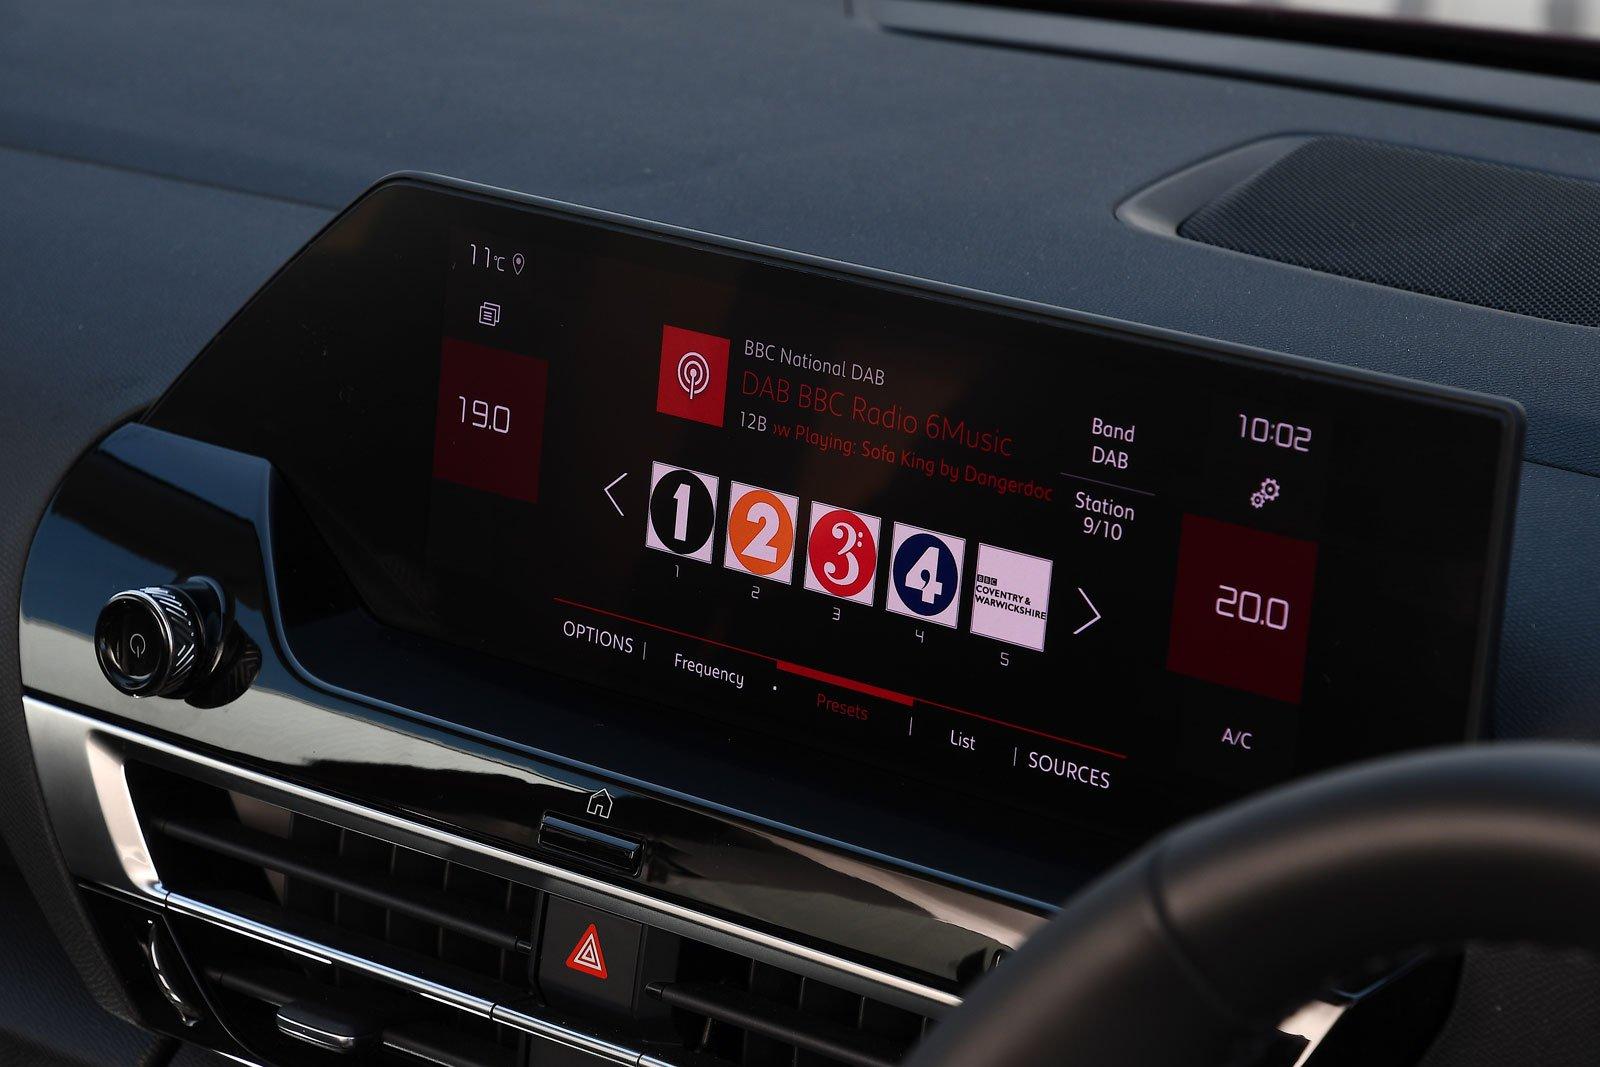 Citroën C4 2021 interior infotainment